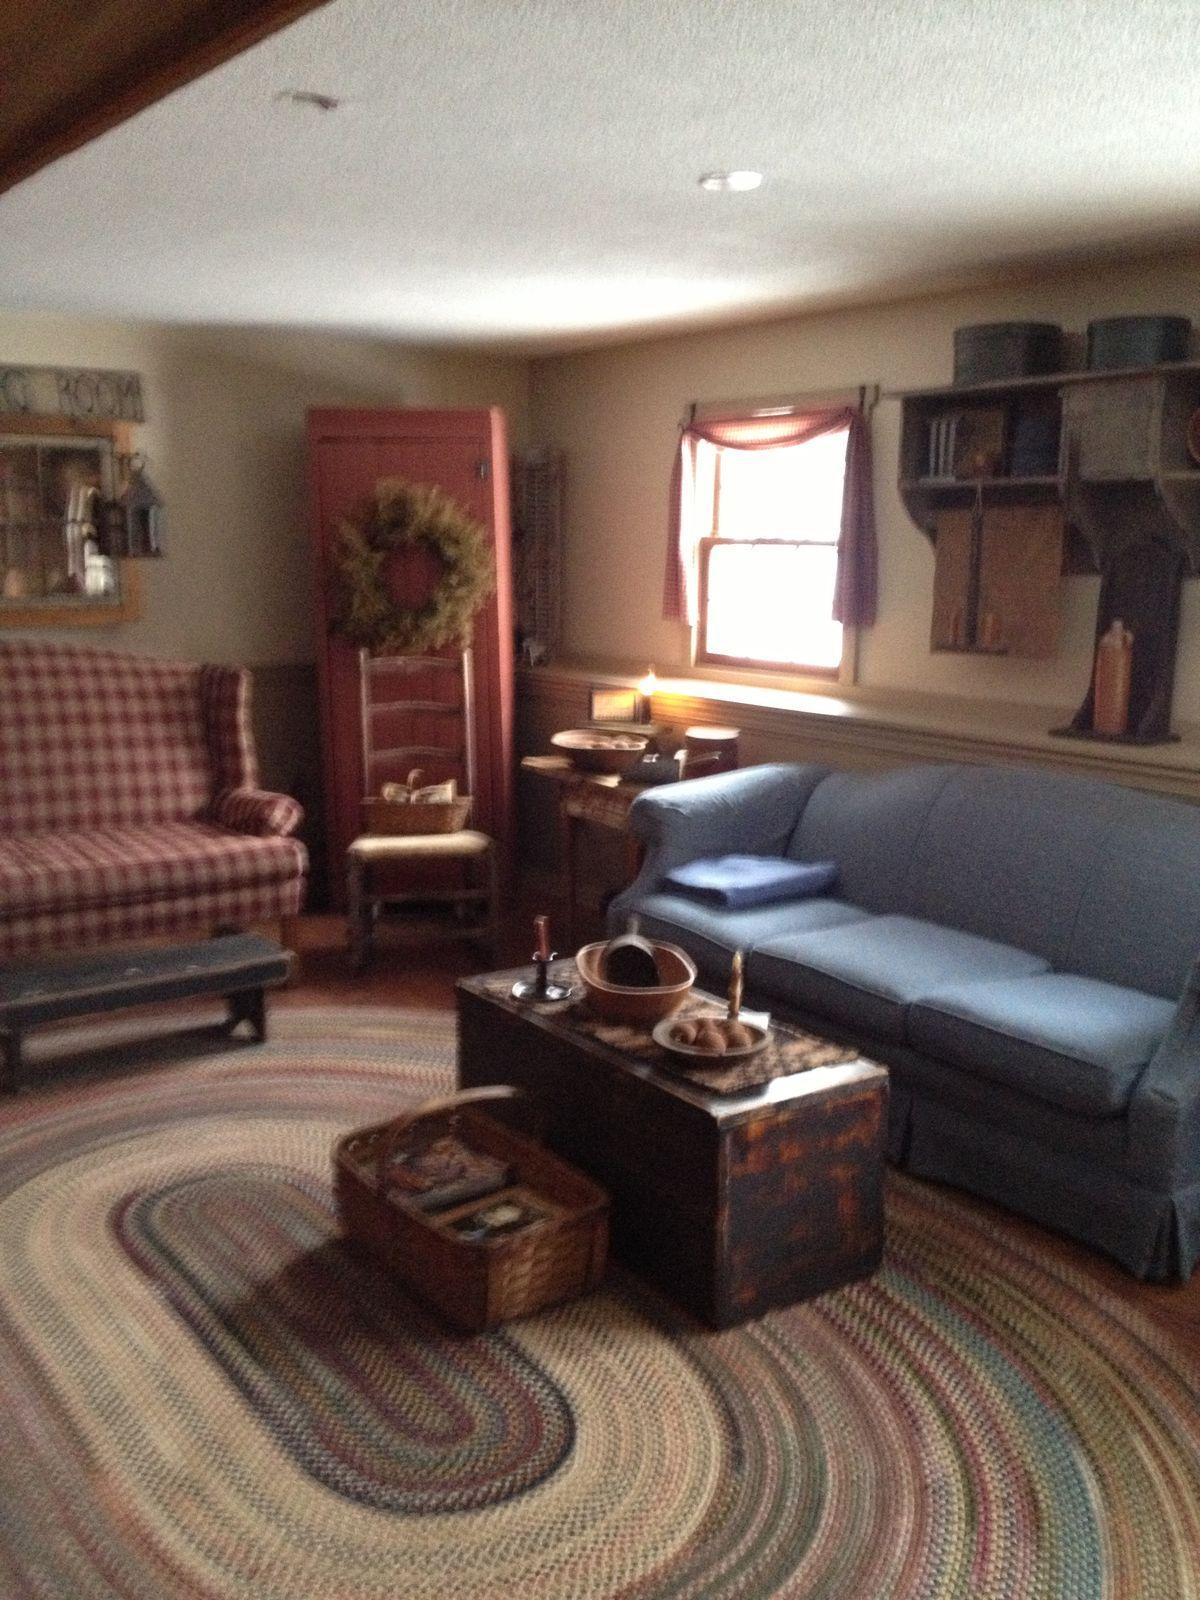 Pin by lisa boisvert on prim living rooms pinterest - Primitive country living room ideas ...